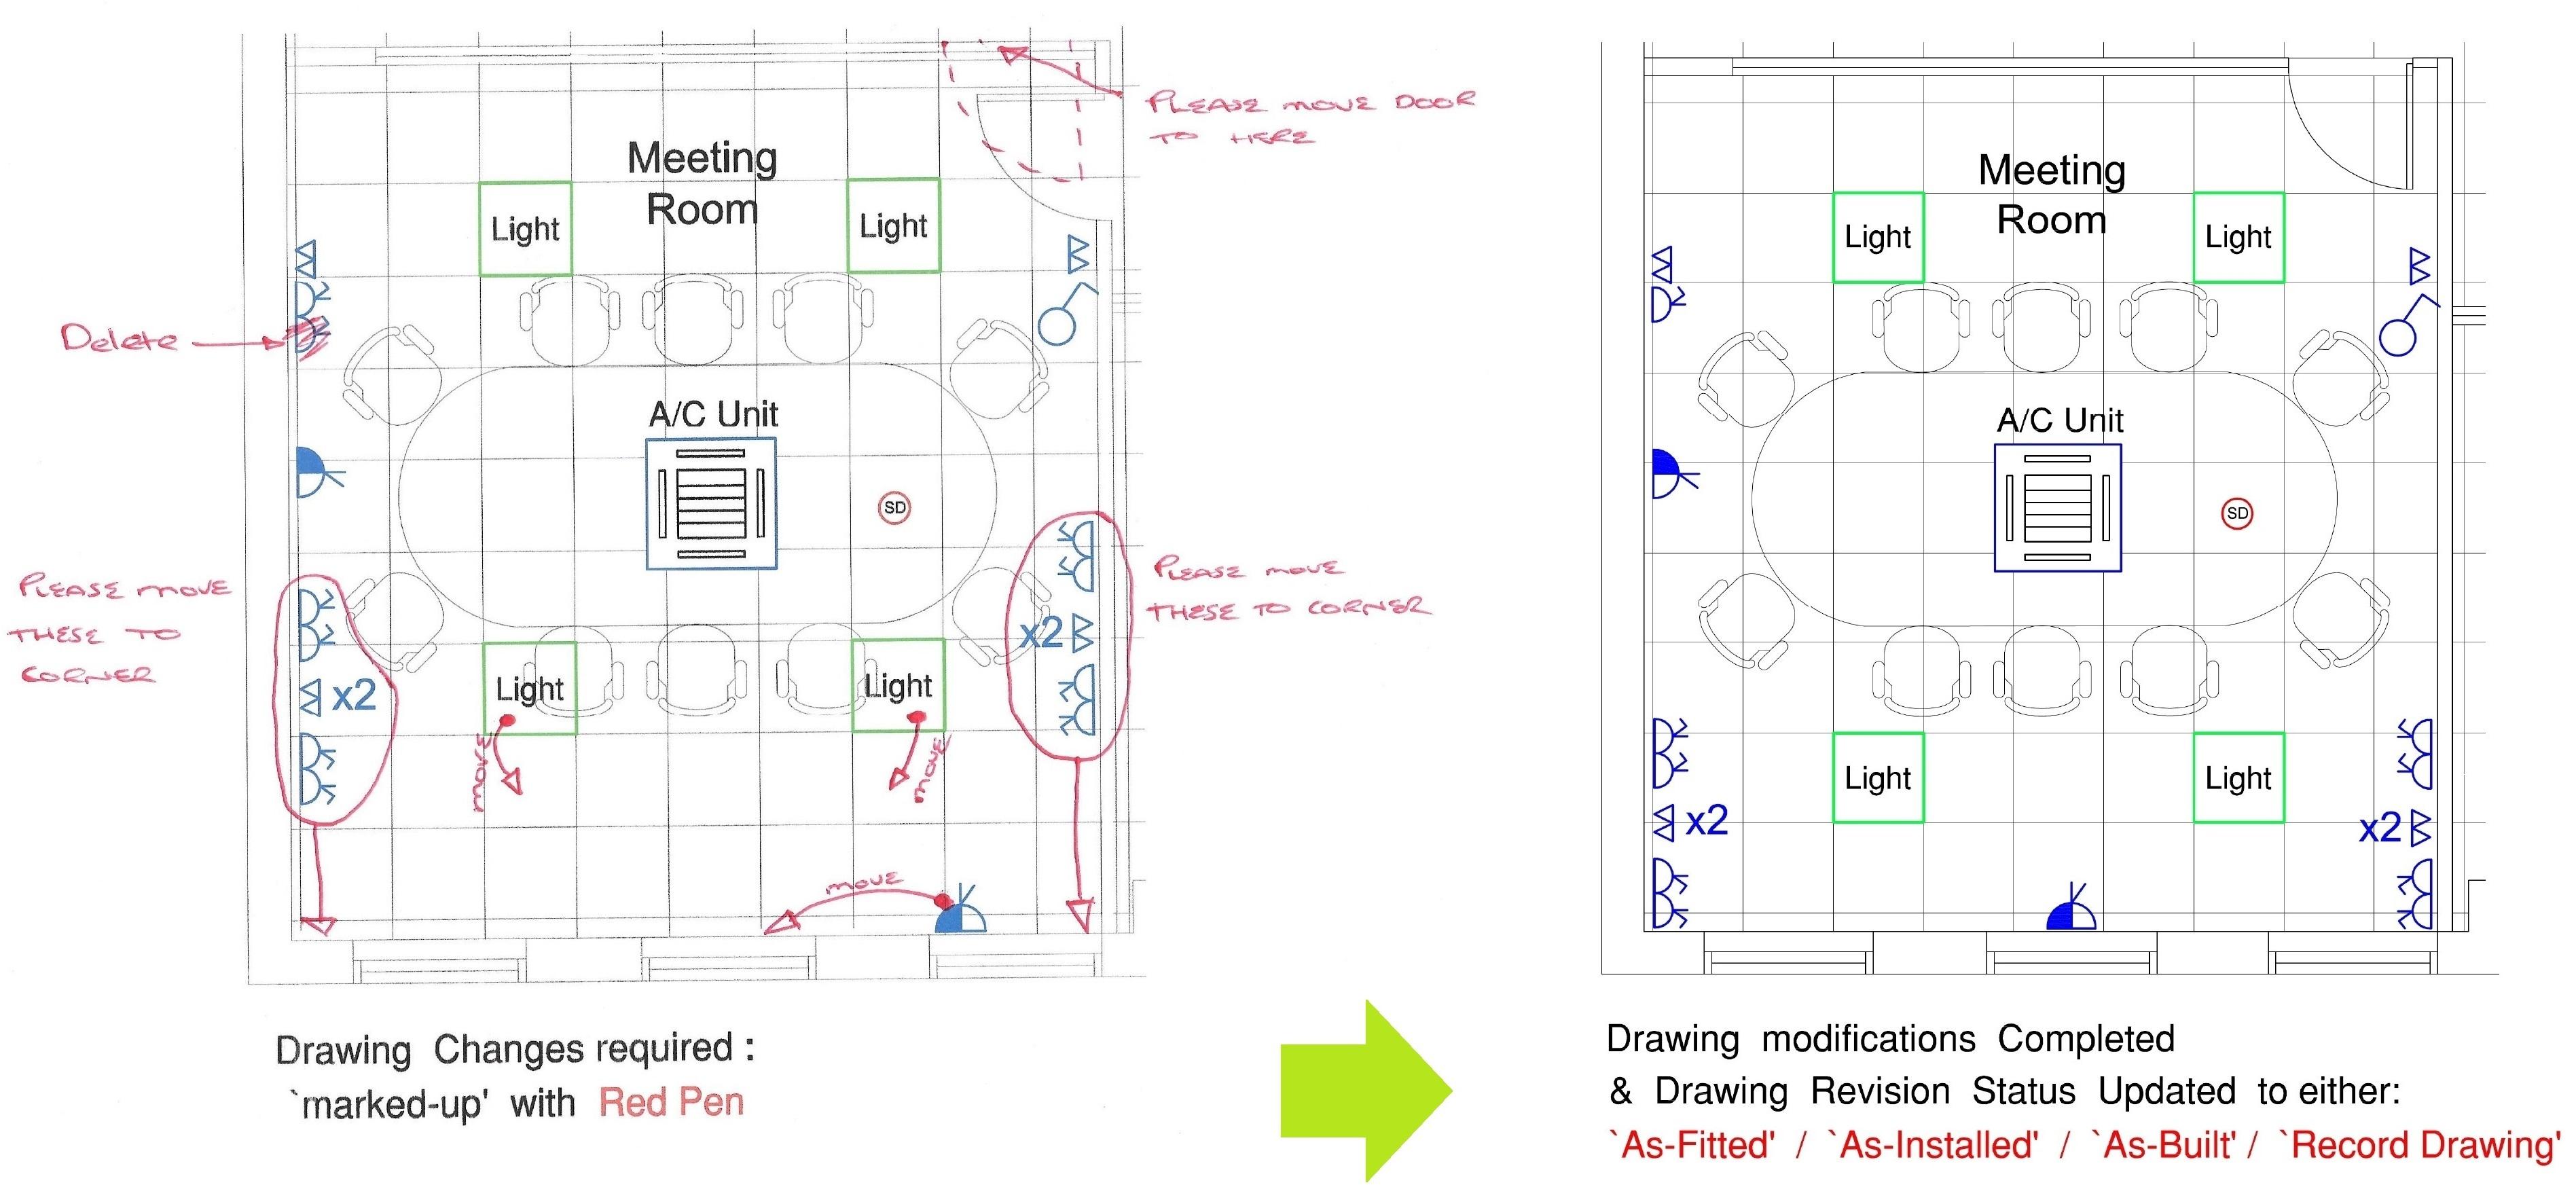 Design & CAD - As Built Drawings